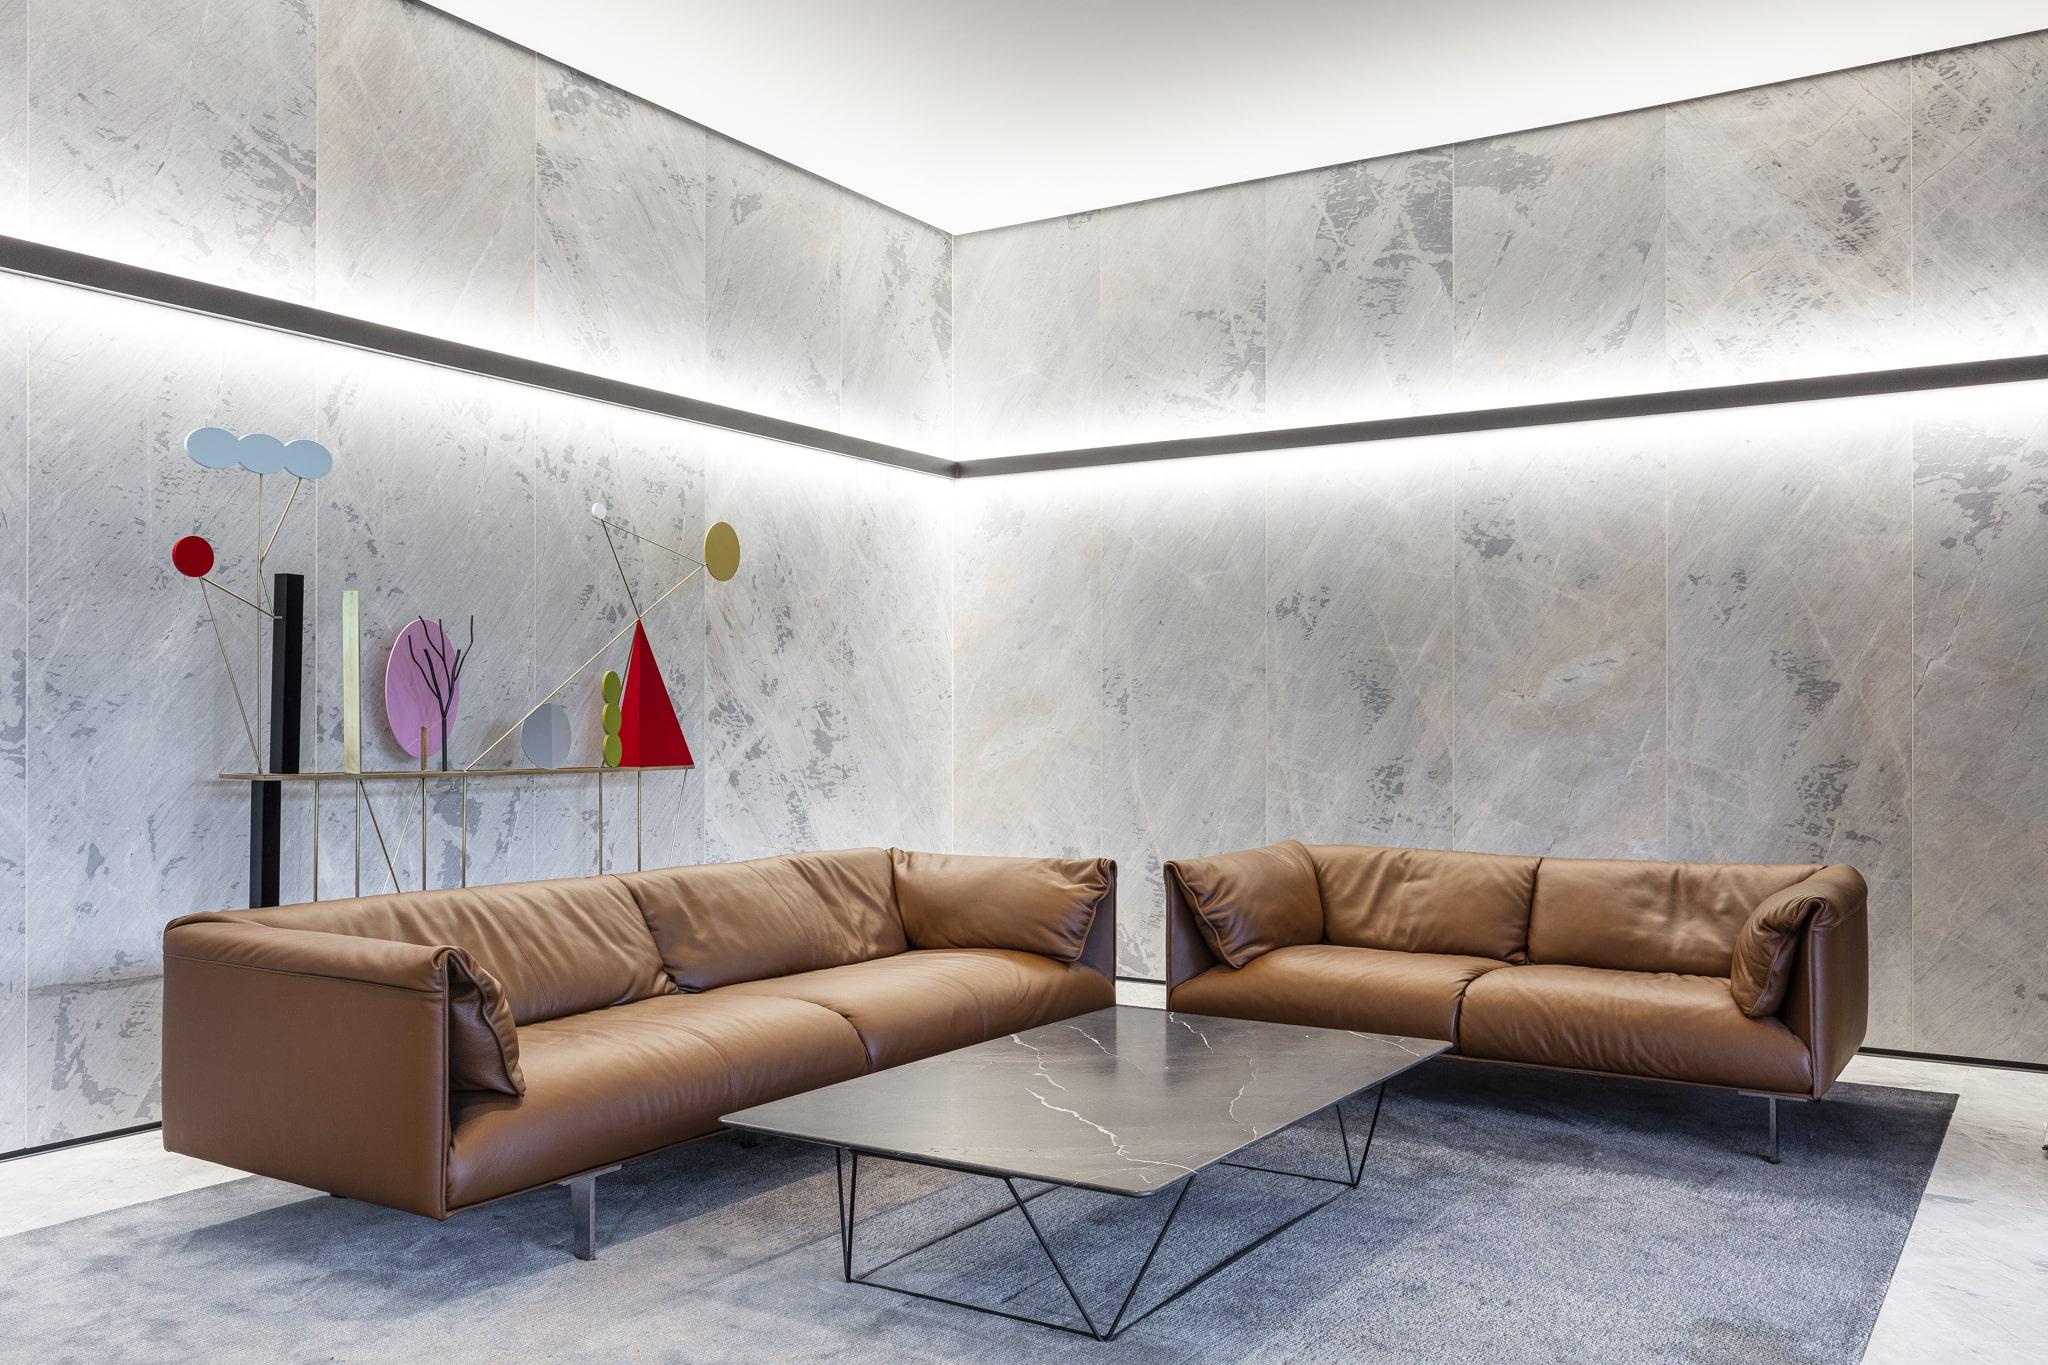 151 macquarie st lobby construction sydney